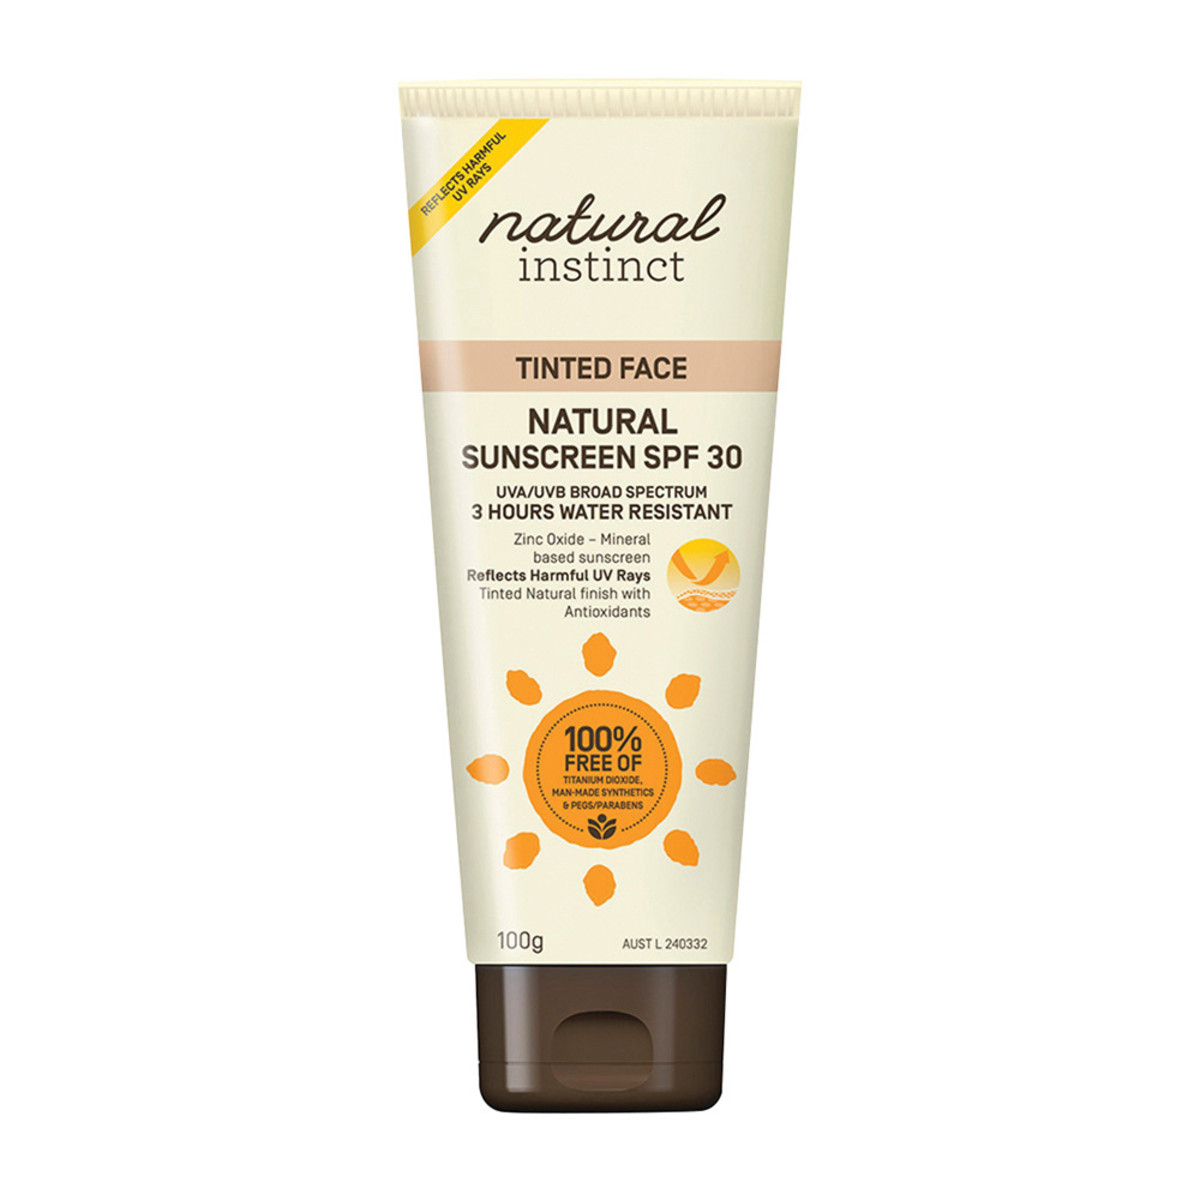 Natural Instinct Sunscreen Tinted Face 100g_media-01